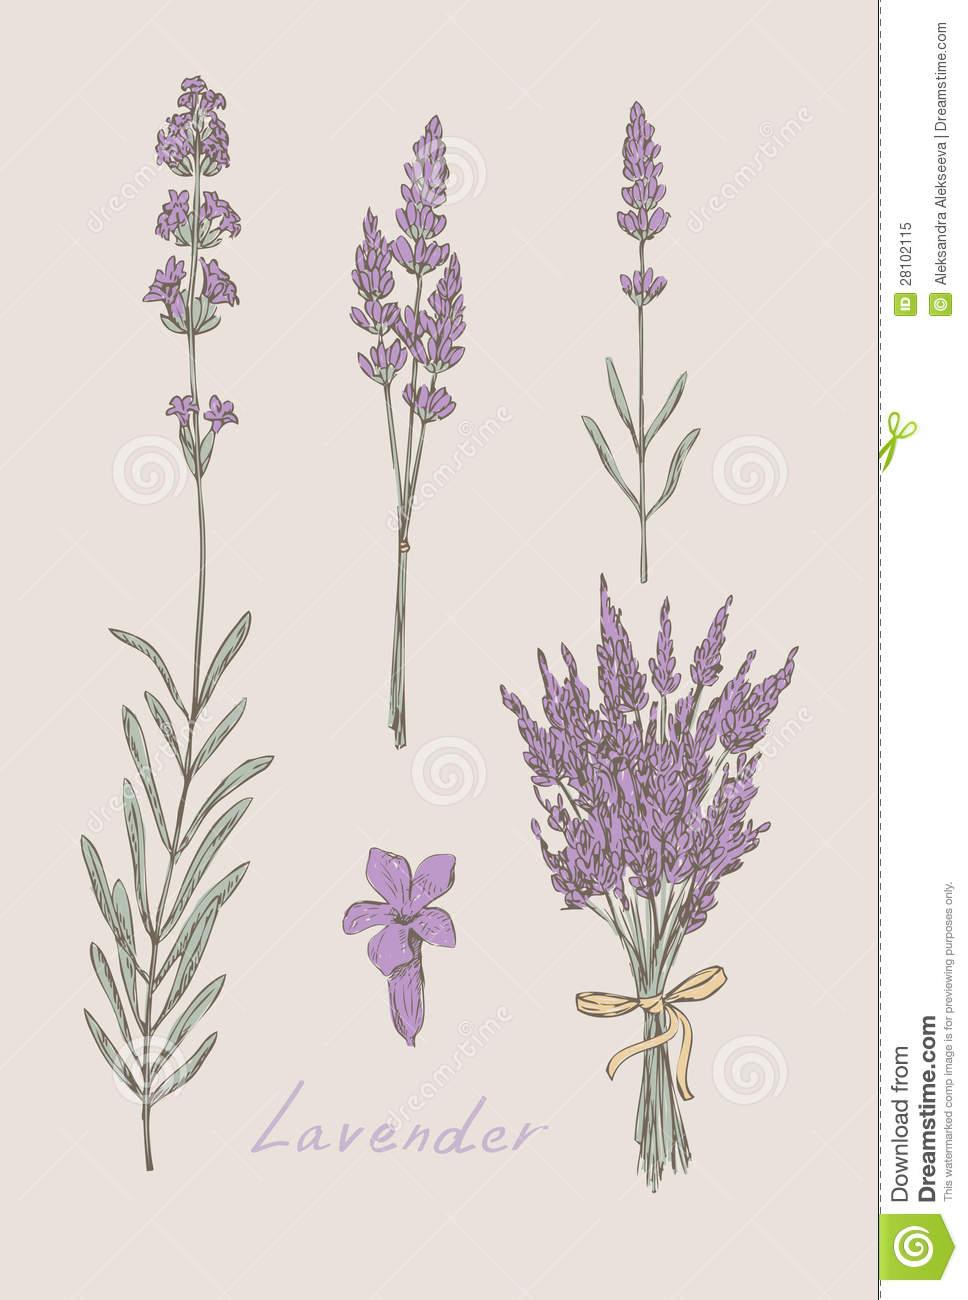 Drawn lavender #1